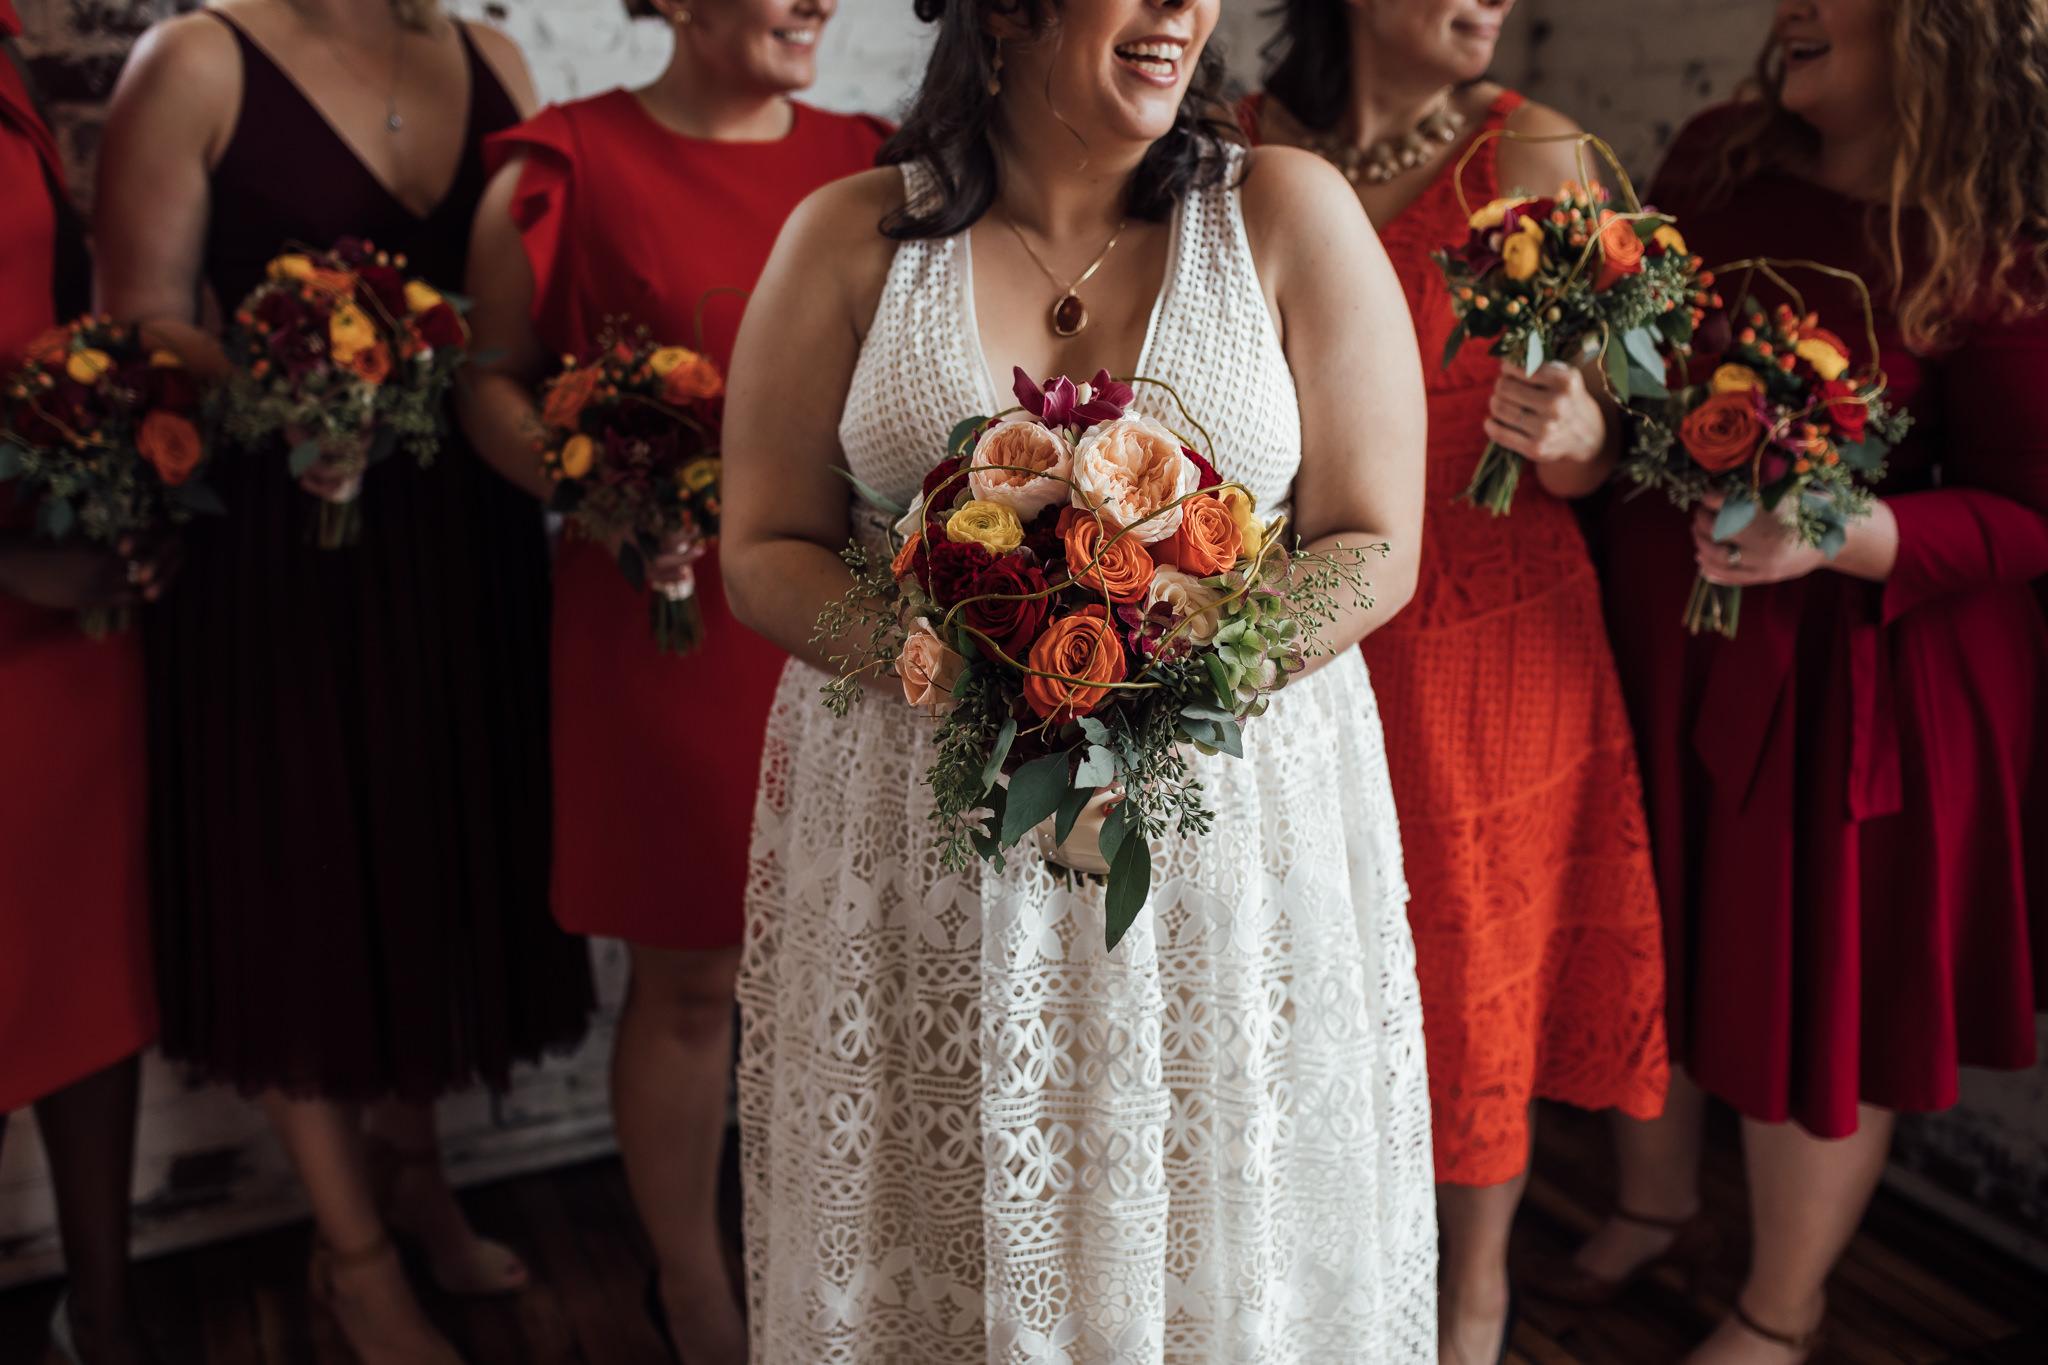 davis-home-strawberry-plains-wedding-cassie-cook-photography-memphis-wedding-photographer-8.jpg